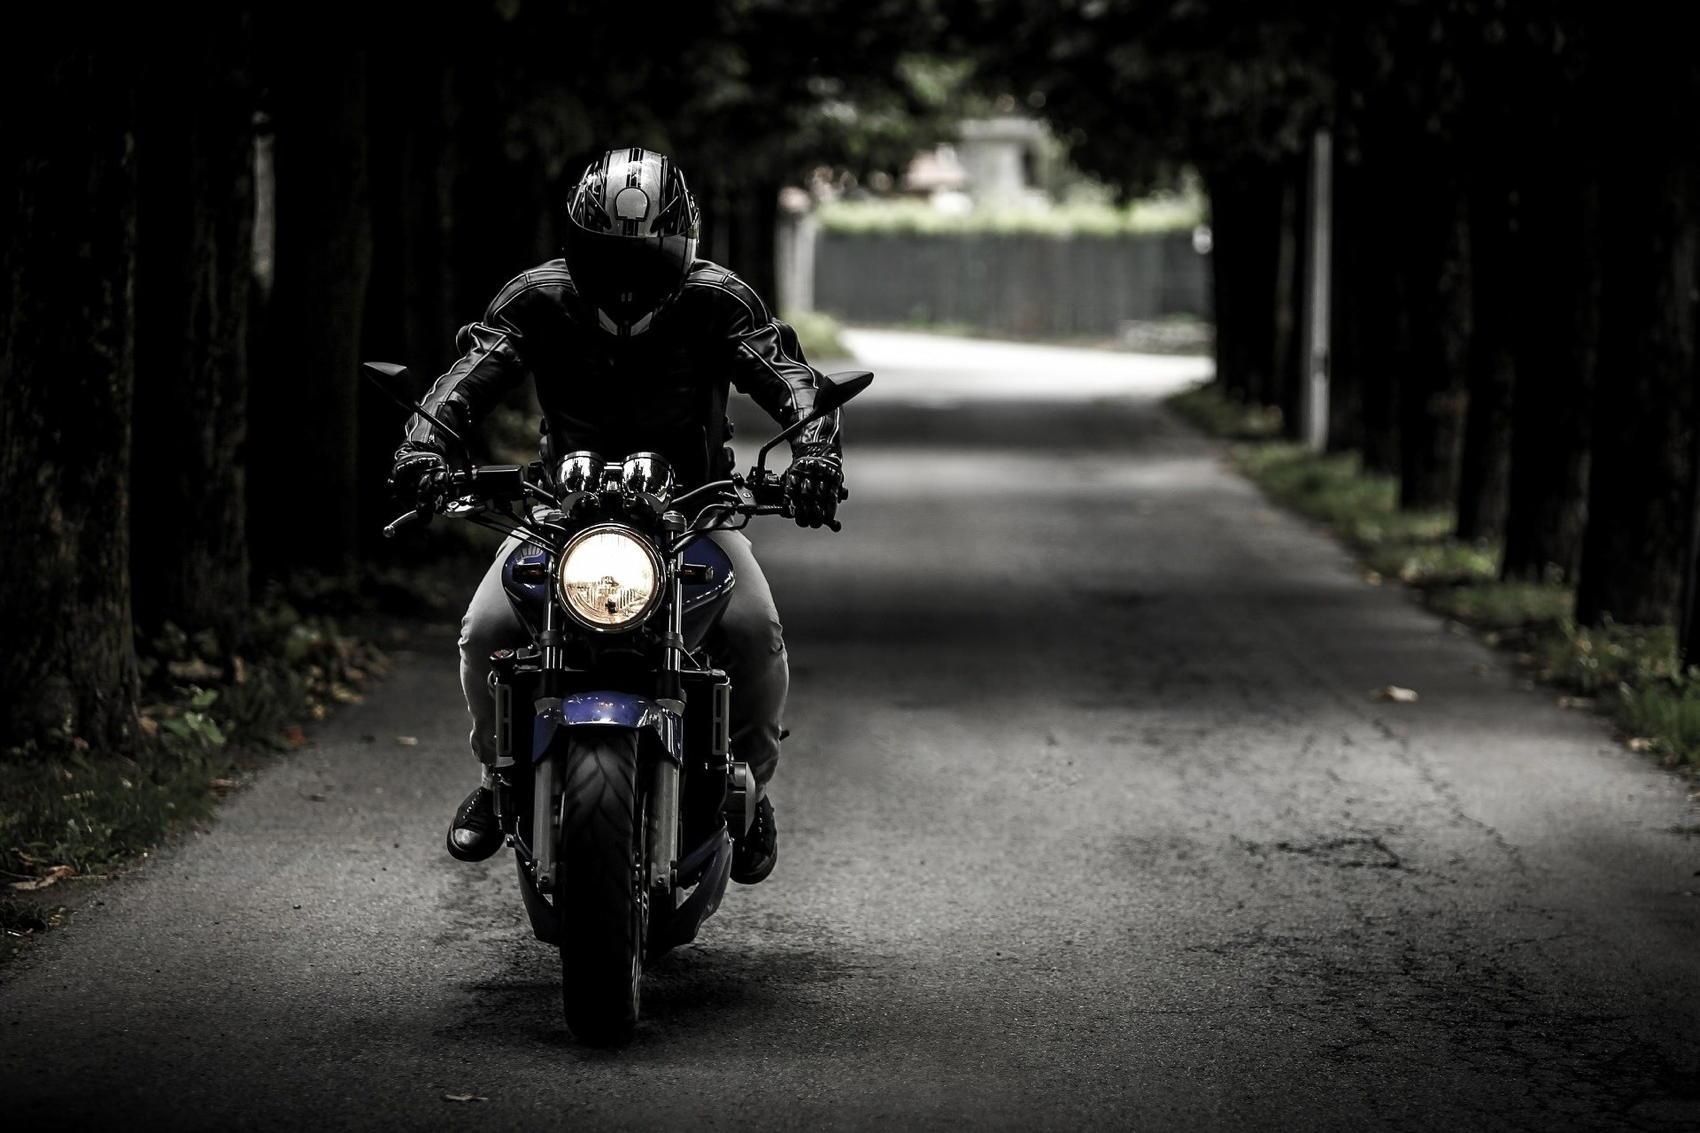 Biker - Image by SplitShire